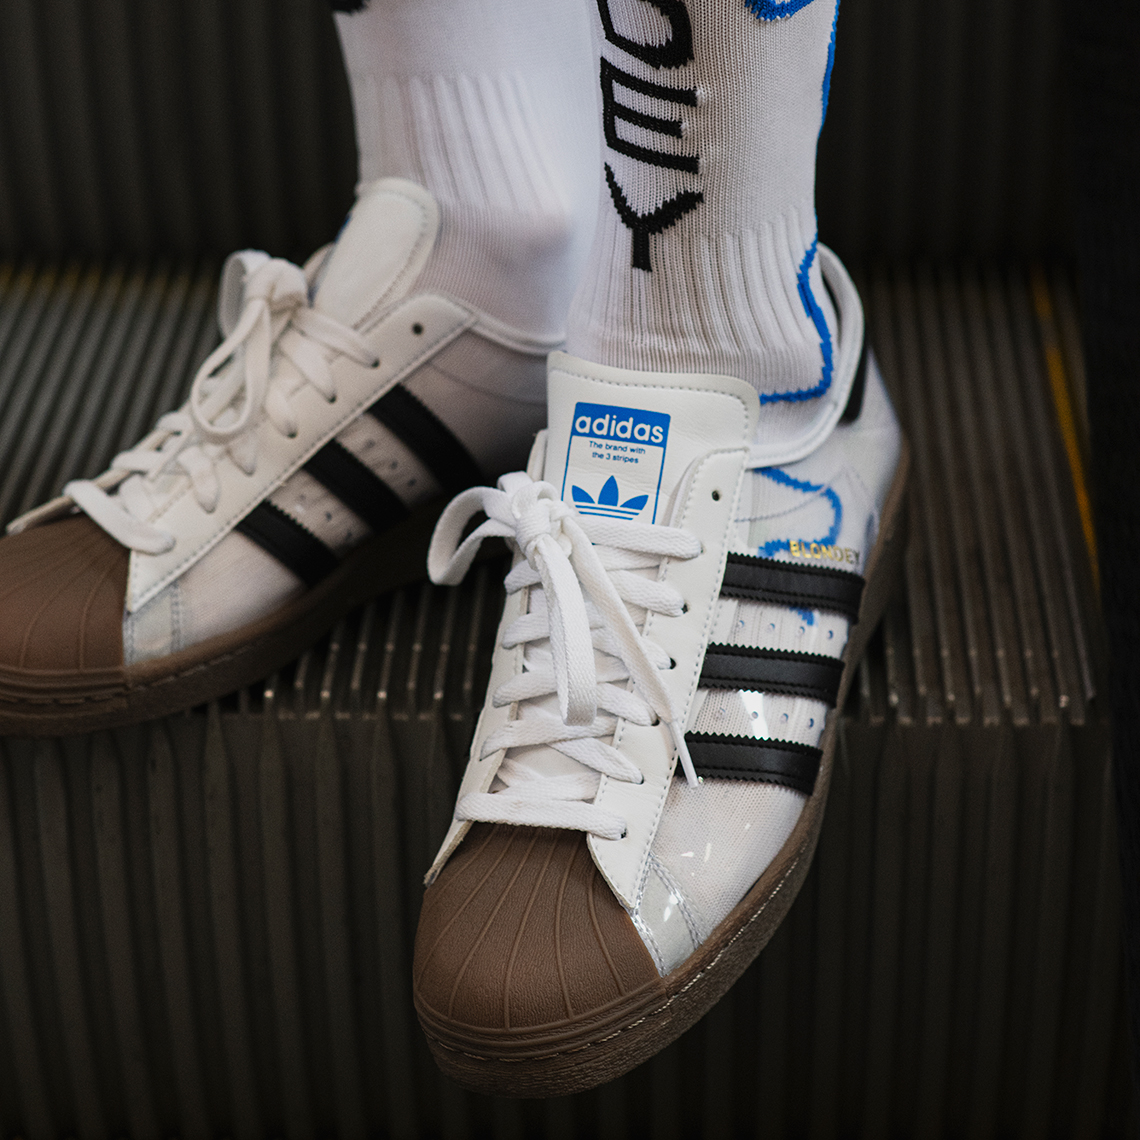 Deze transparante Adidas Superstar sneakers kleur je met je